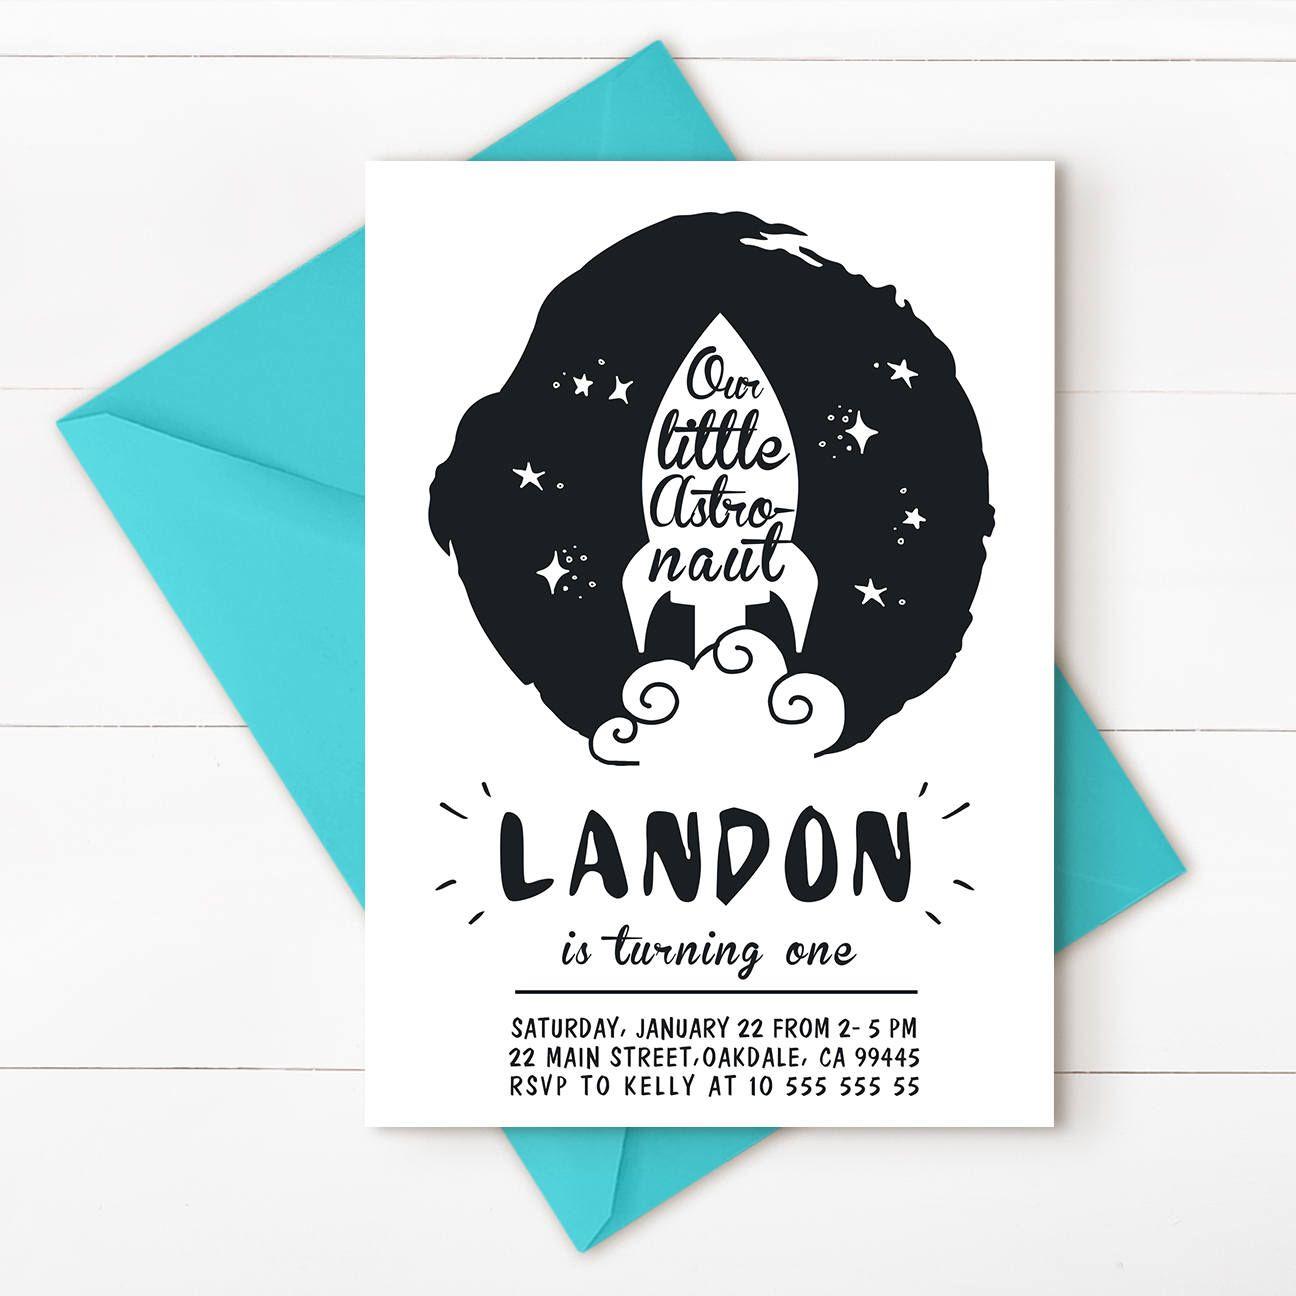 Pin by L\'Anna McElduff on Hudsons 1st Birthday | Pinterest ...